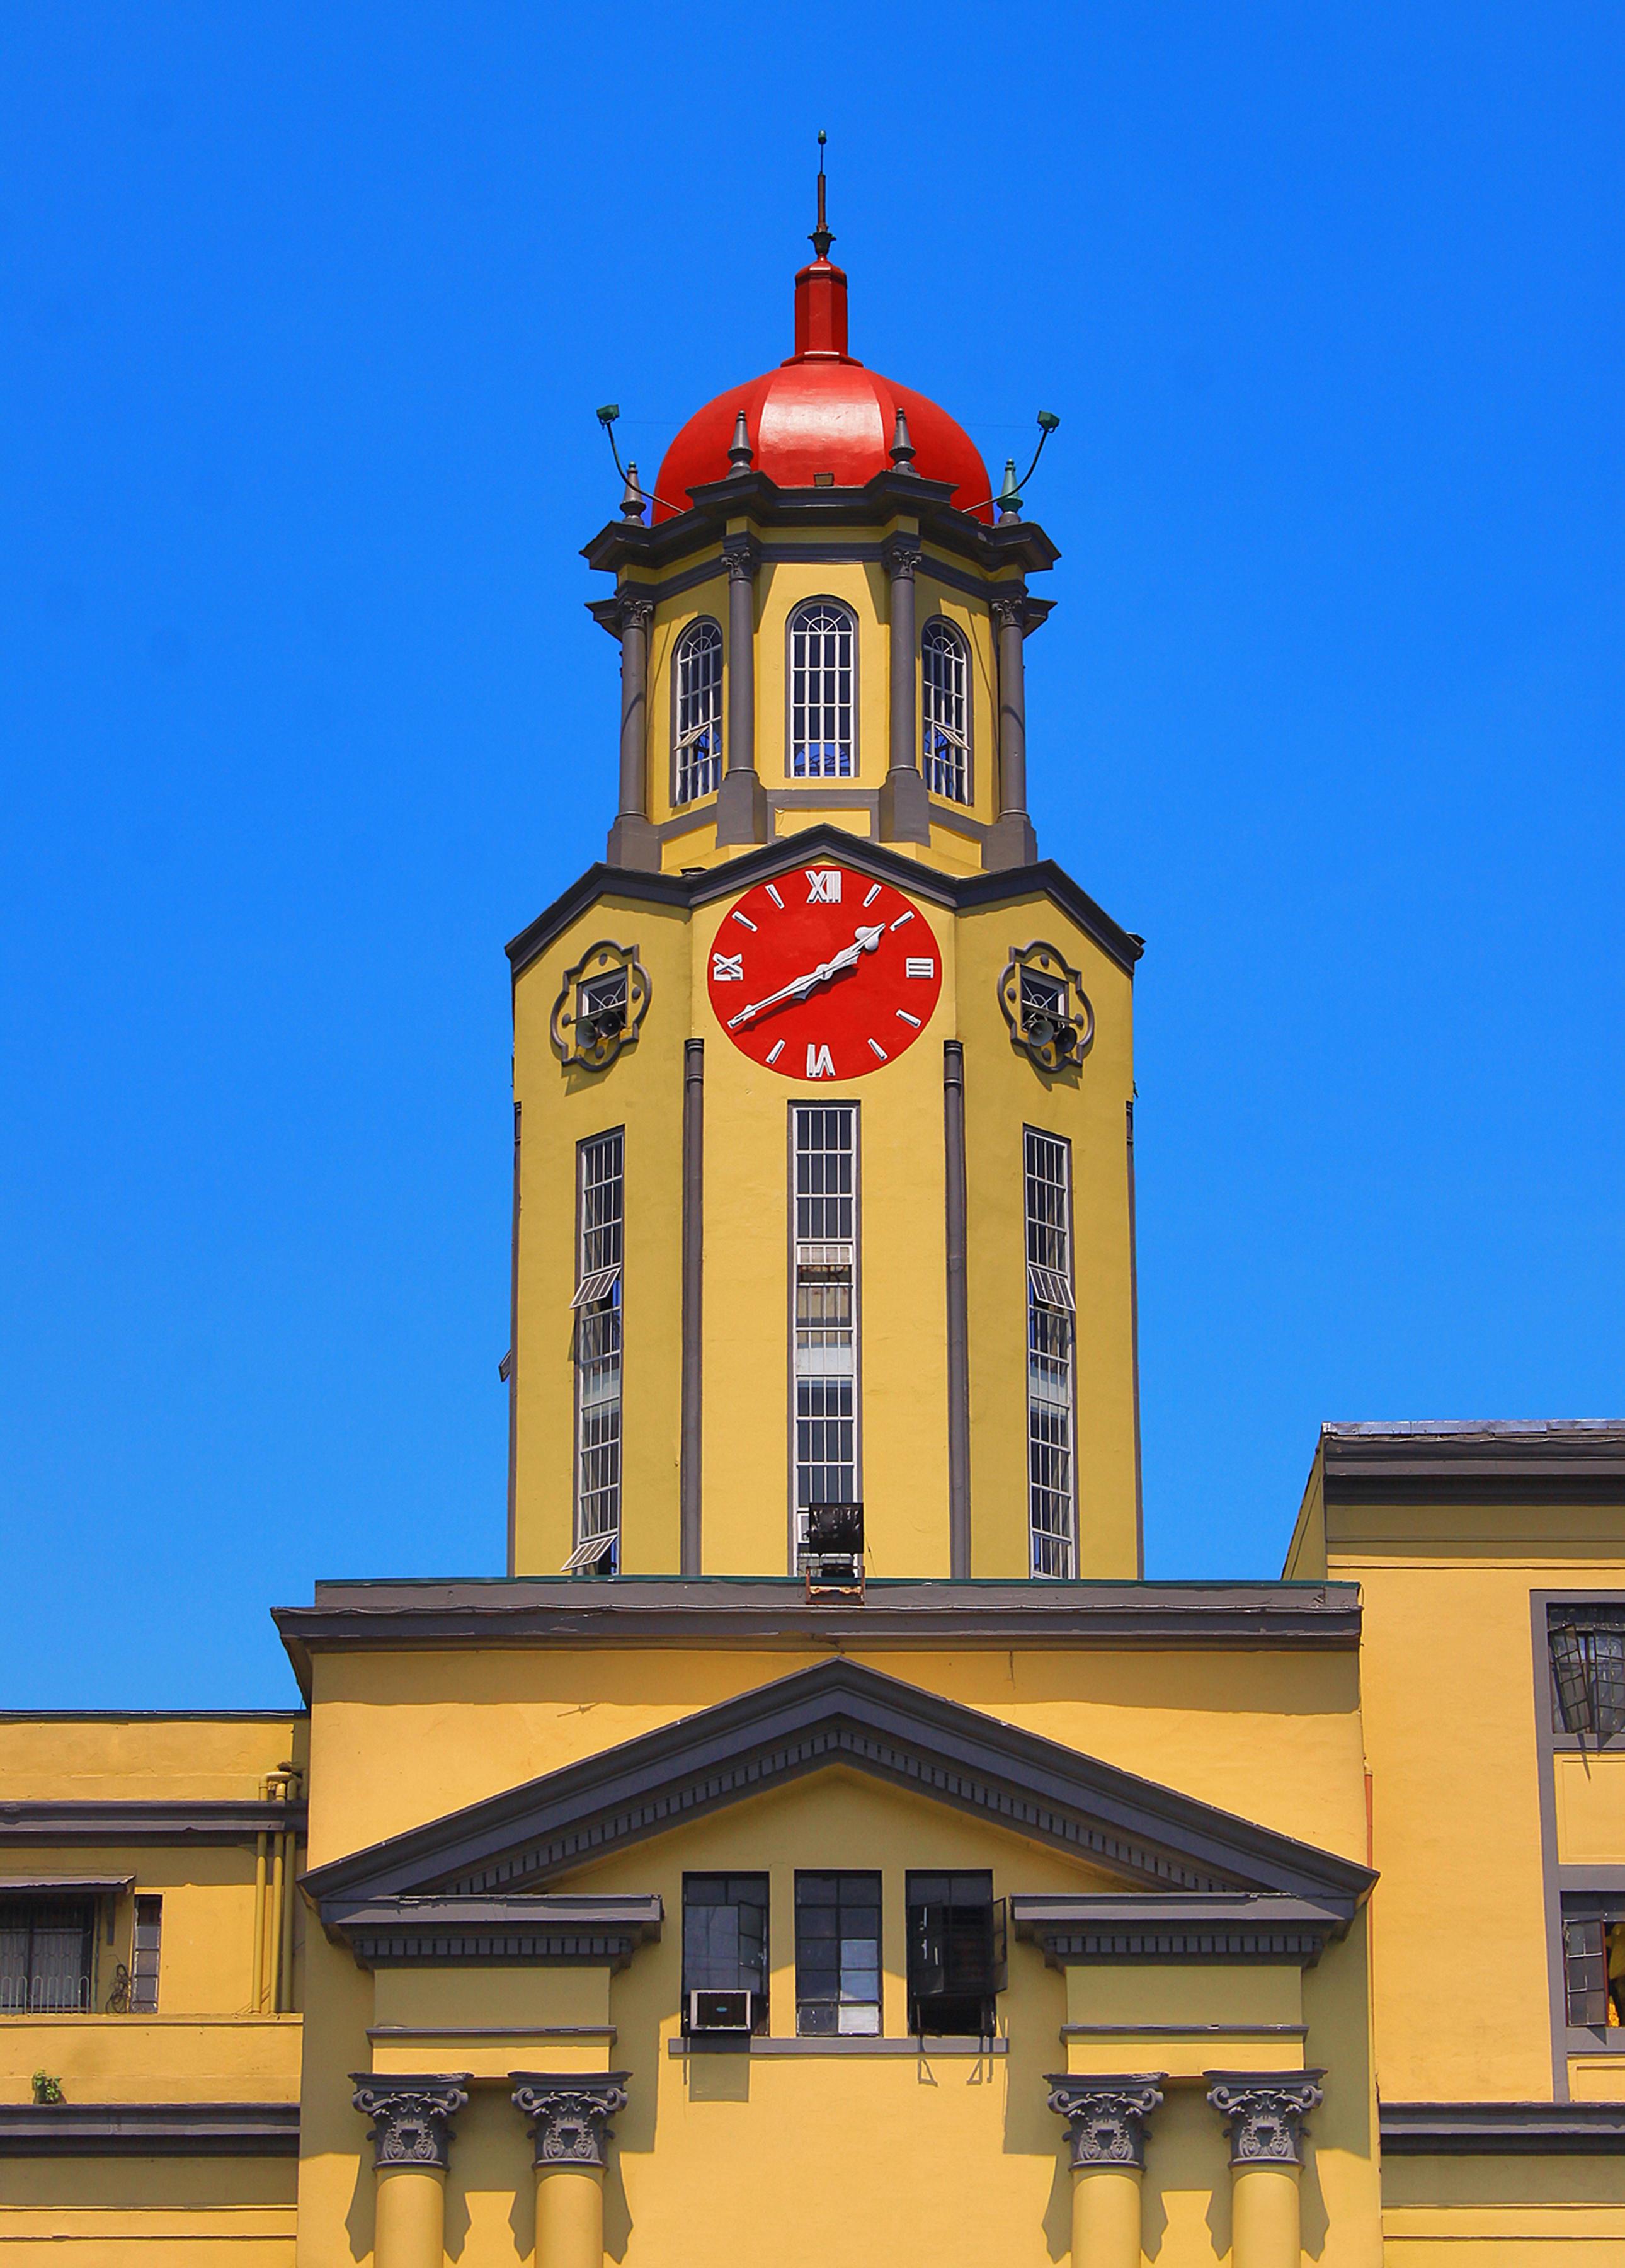 Manila City Hall Clock Tower